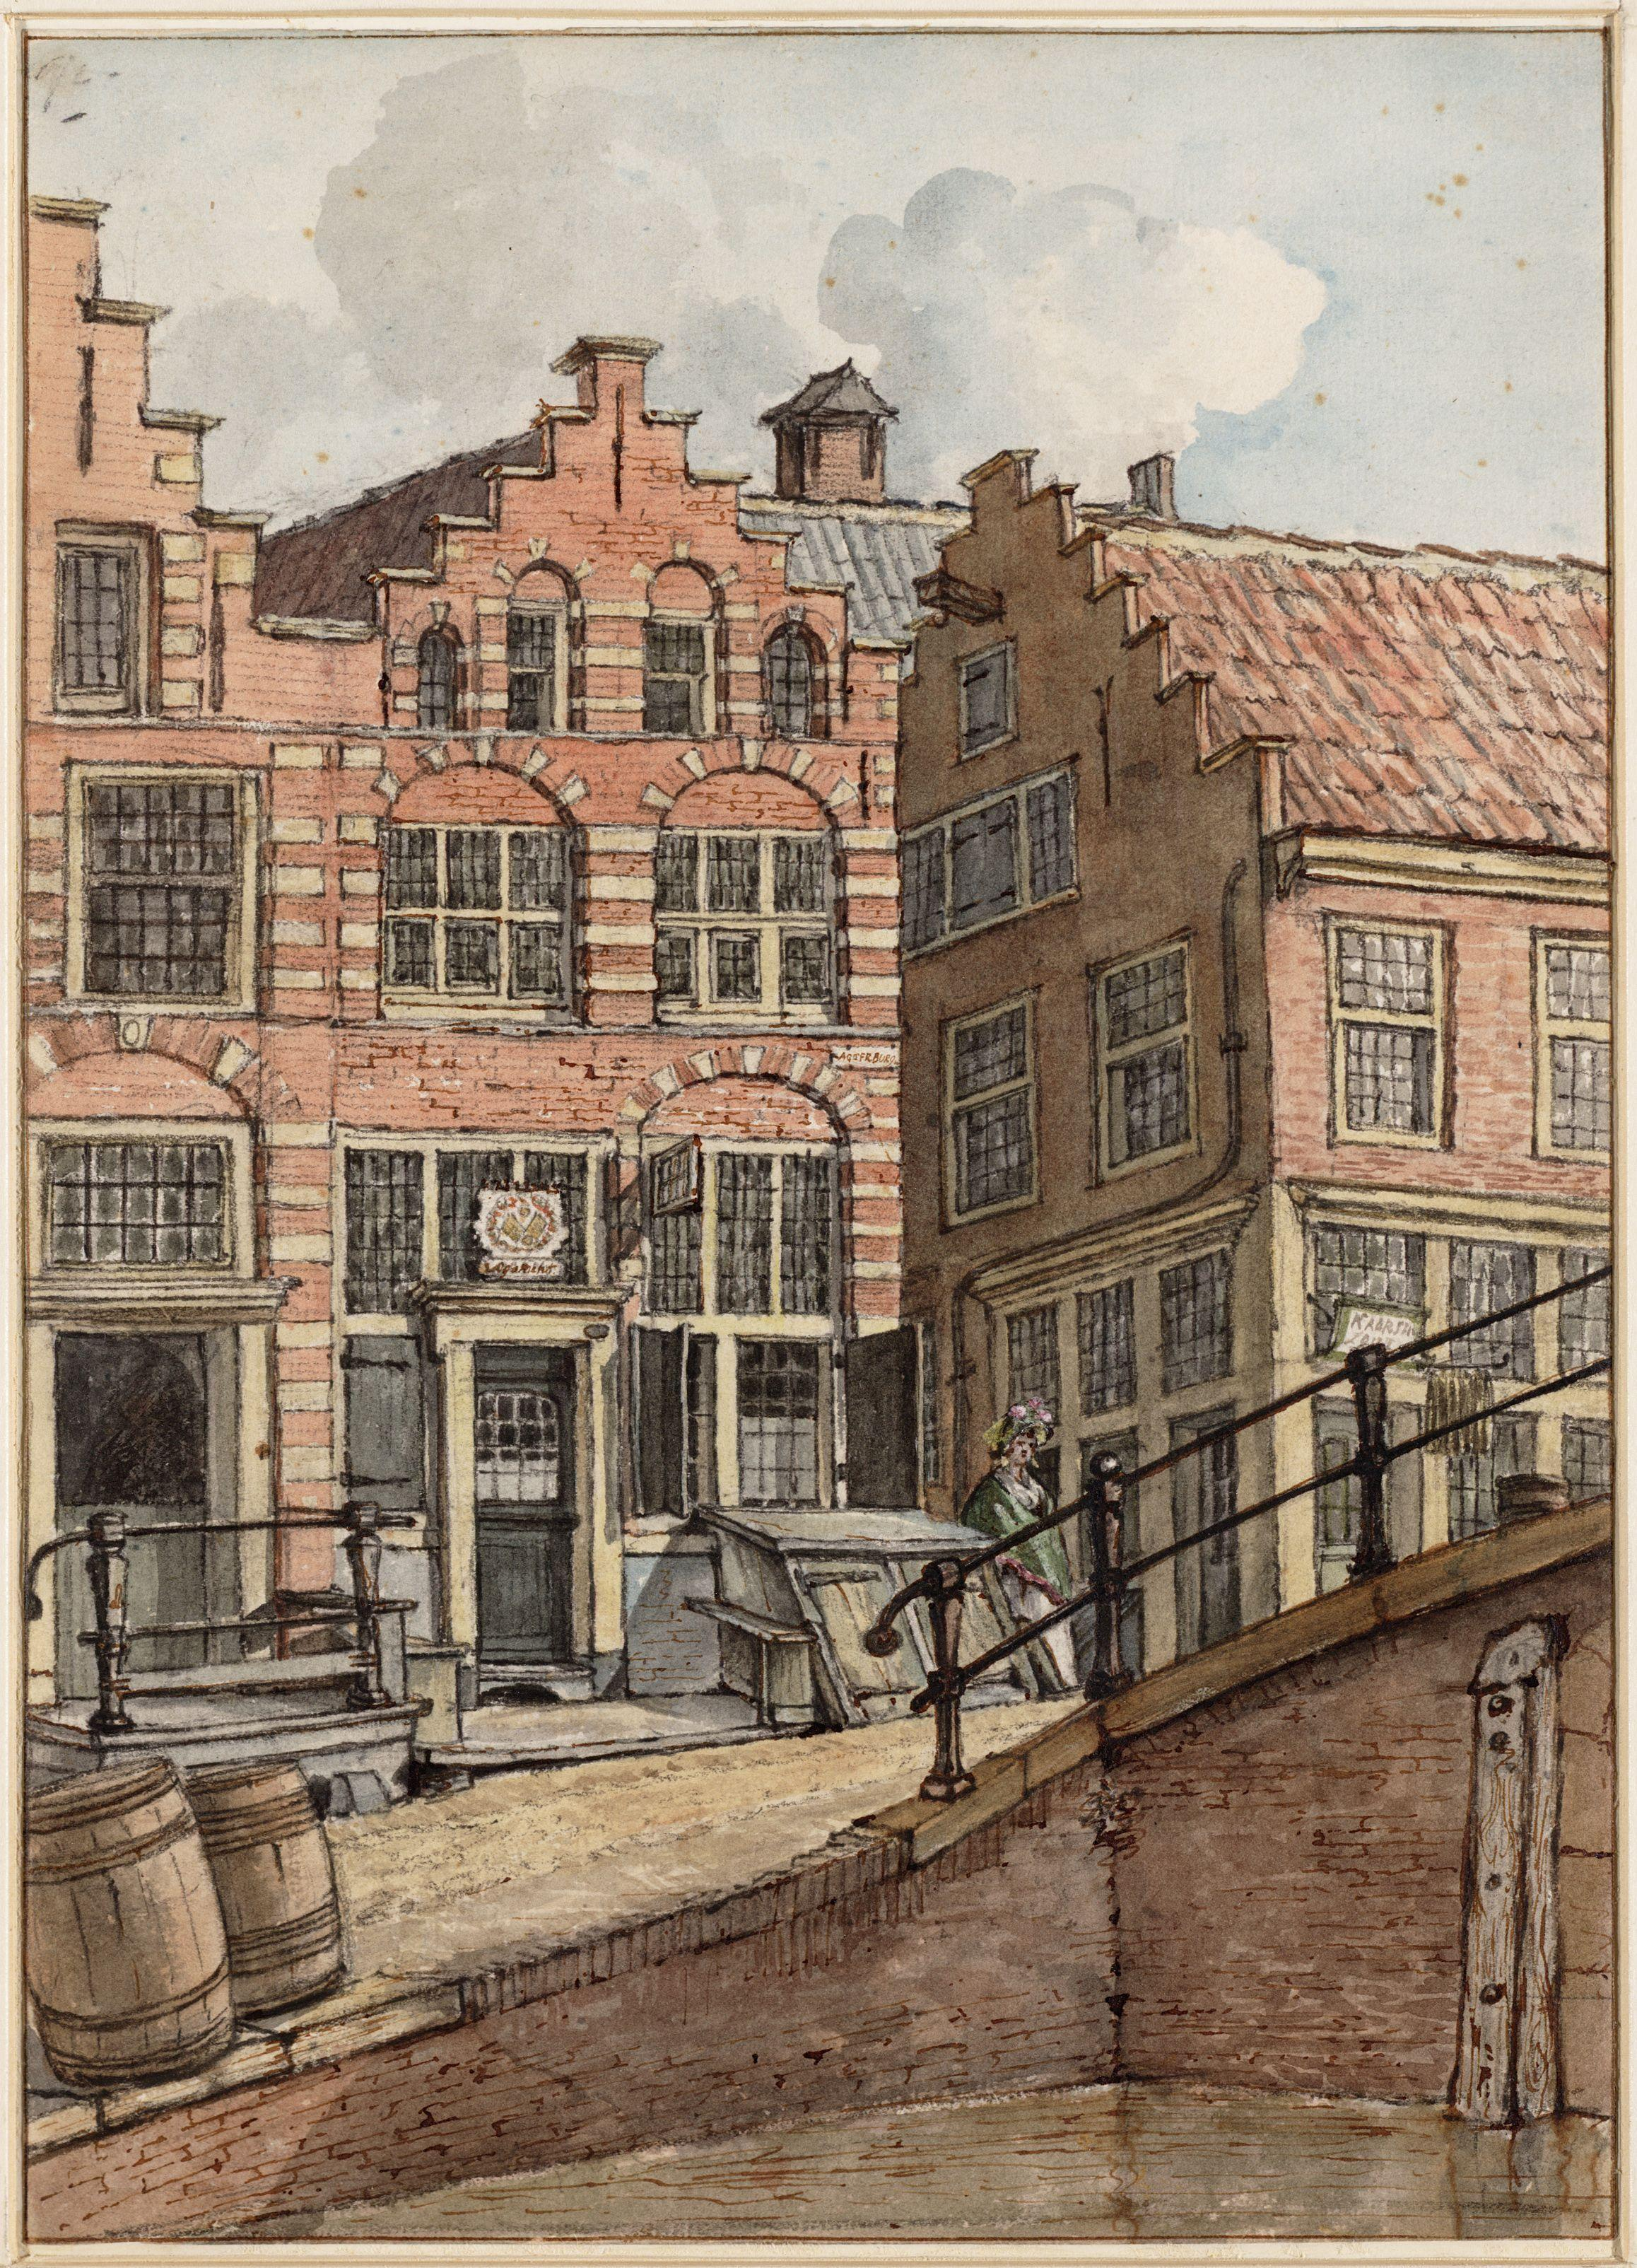 File:Gerrit Lamberts (1776-1850), Afb 010097001802.jpg - Wikimedia Commons